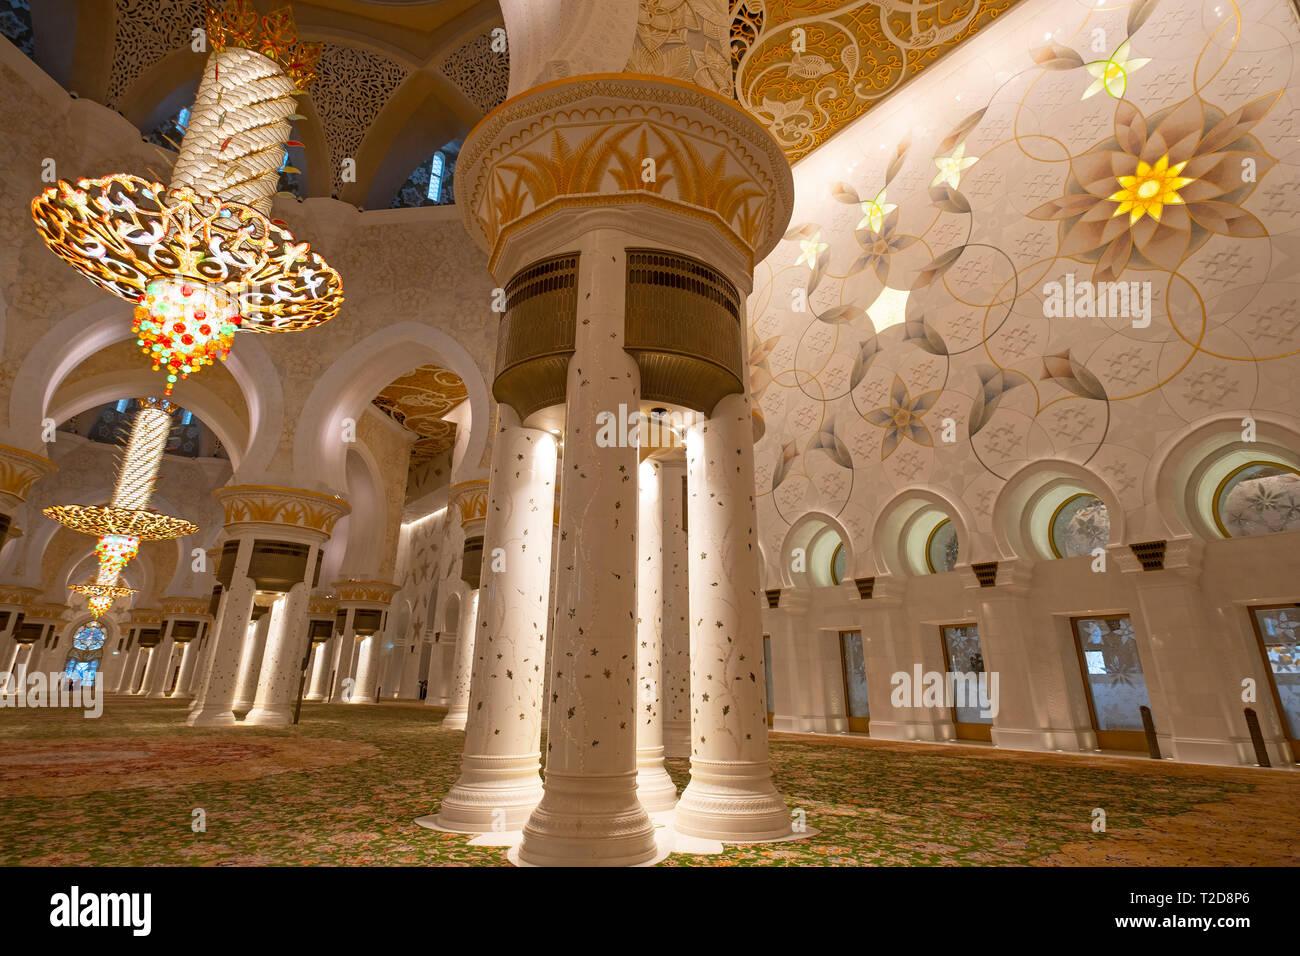 Sheikh Zayed Grand Mosque prayer hall, Abu Dhabi, United Arab Emirates - Stock Image